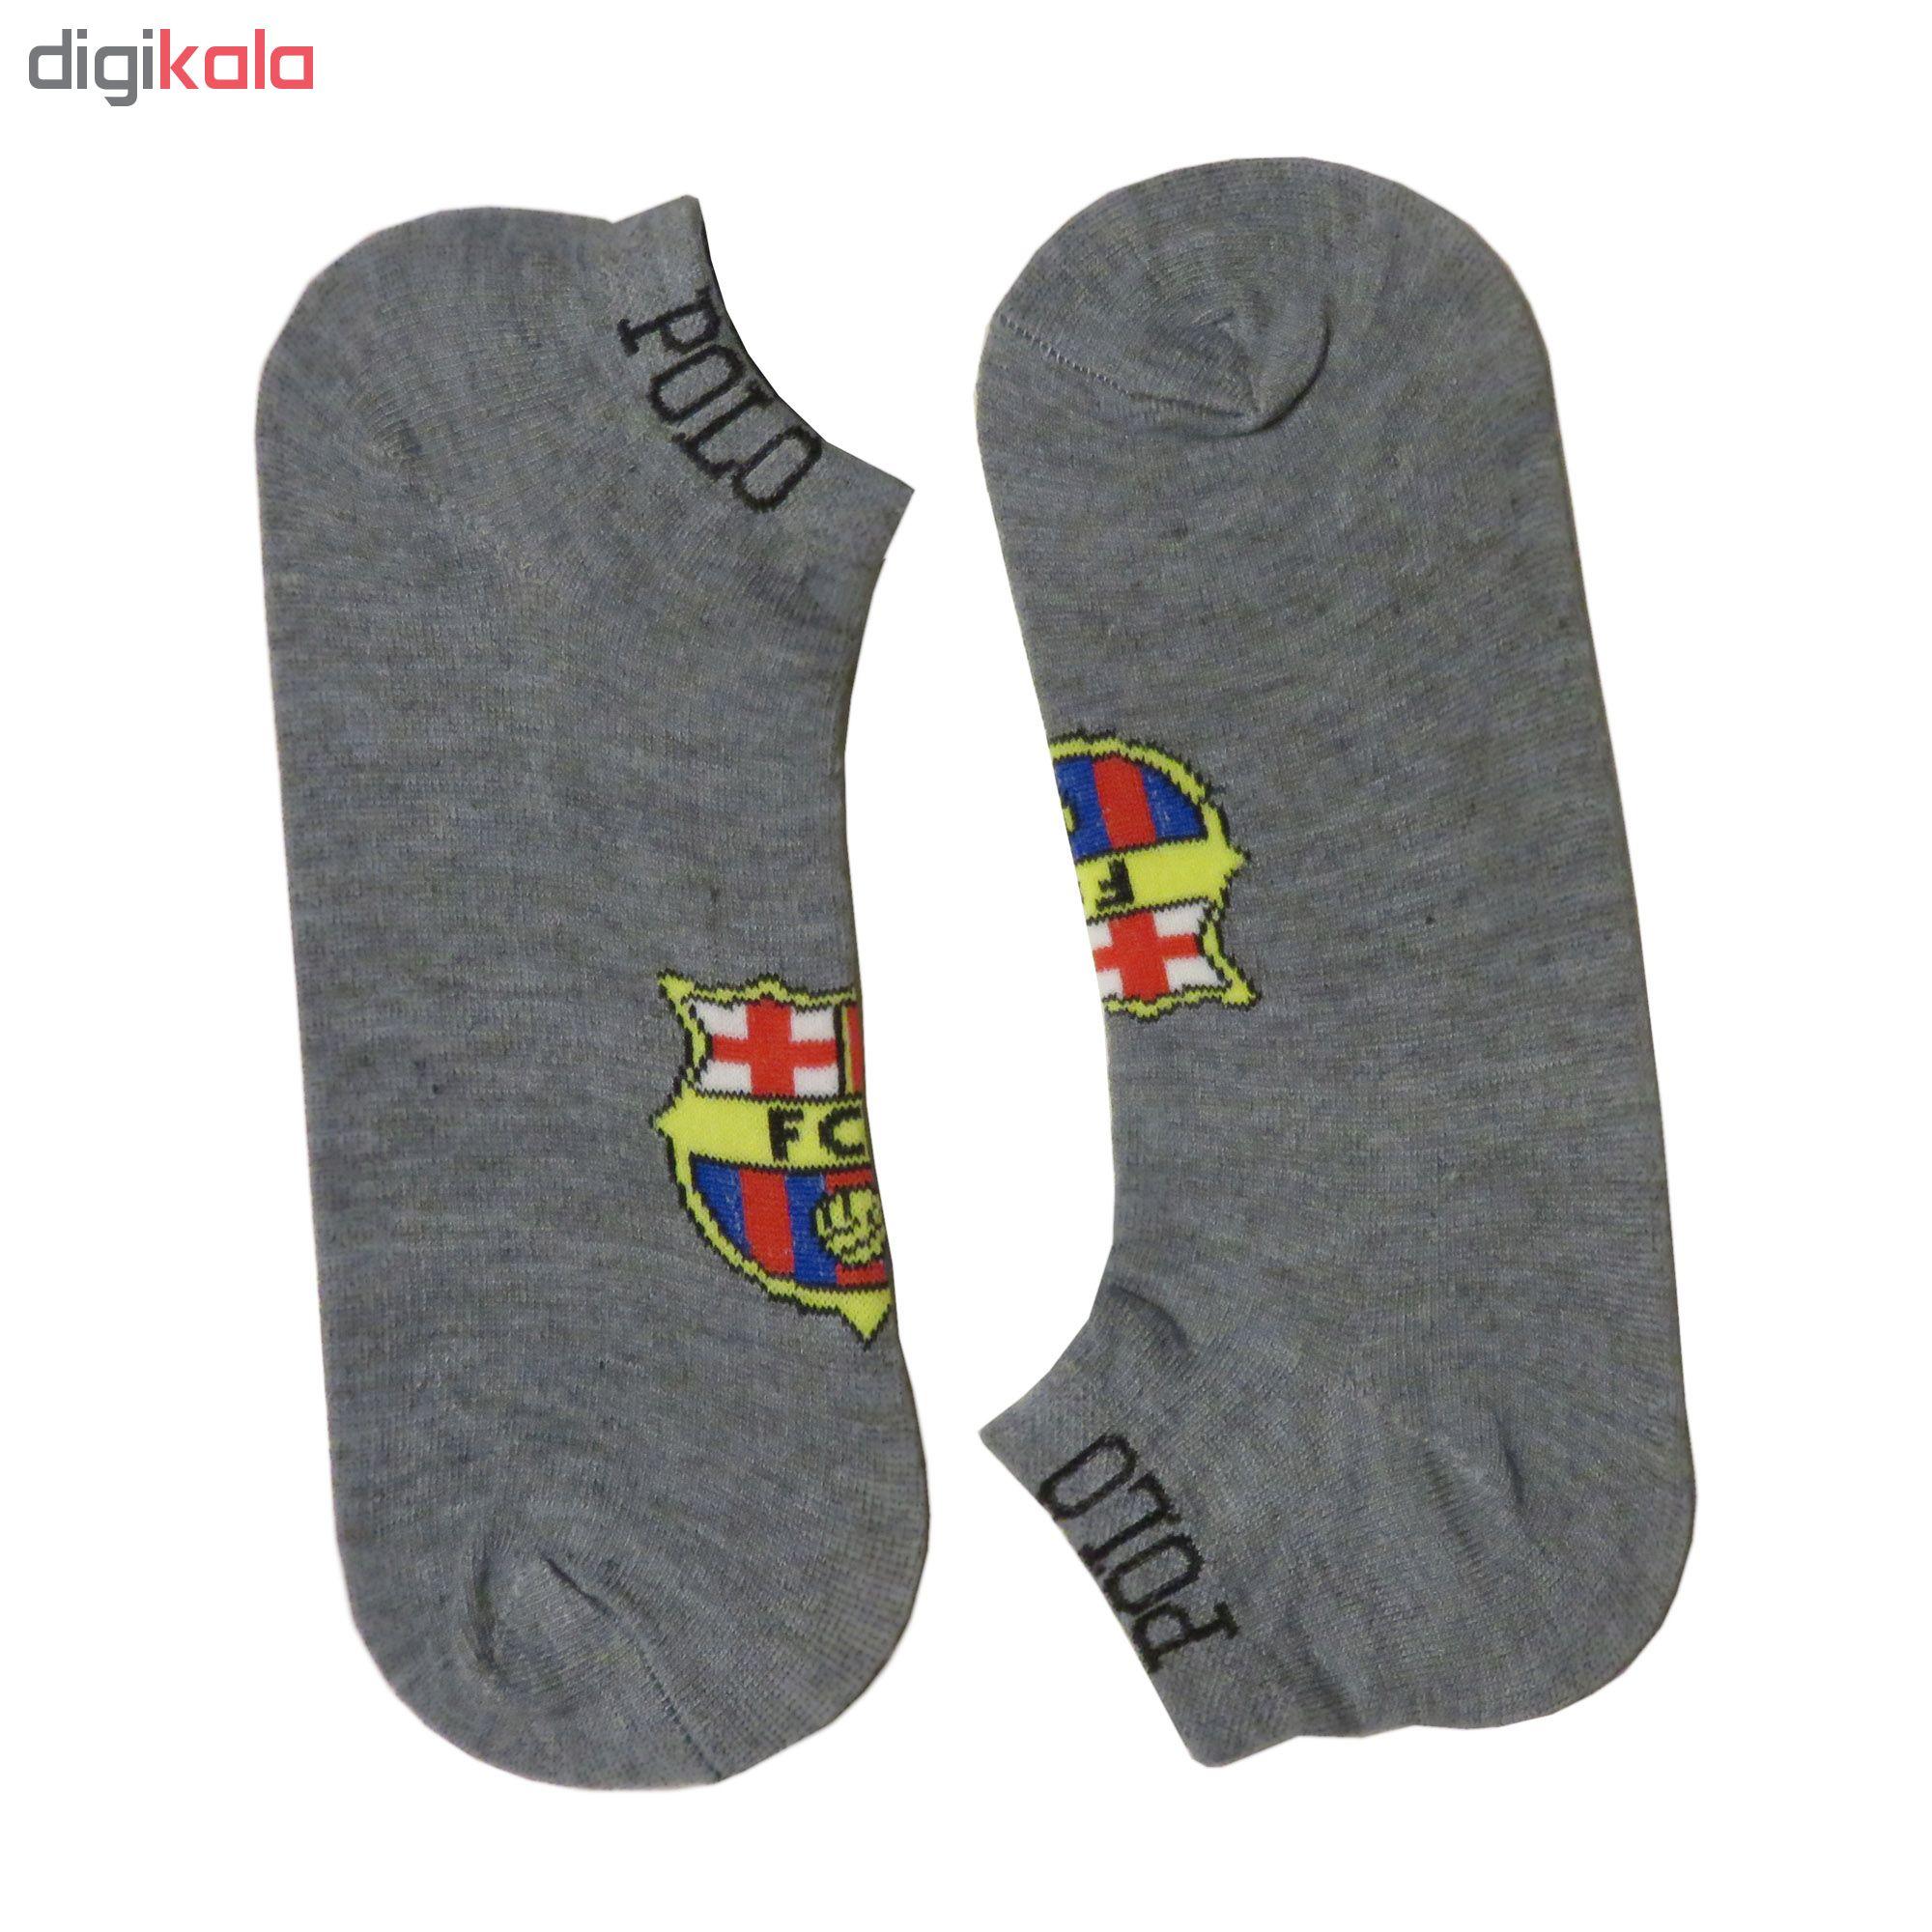 جوراب مردانه طرح بارسلونا کد 110 رنگ طوسی main 1 1